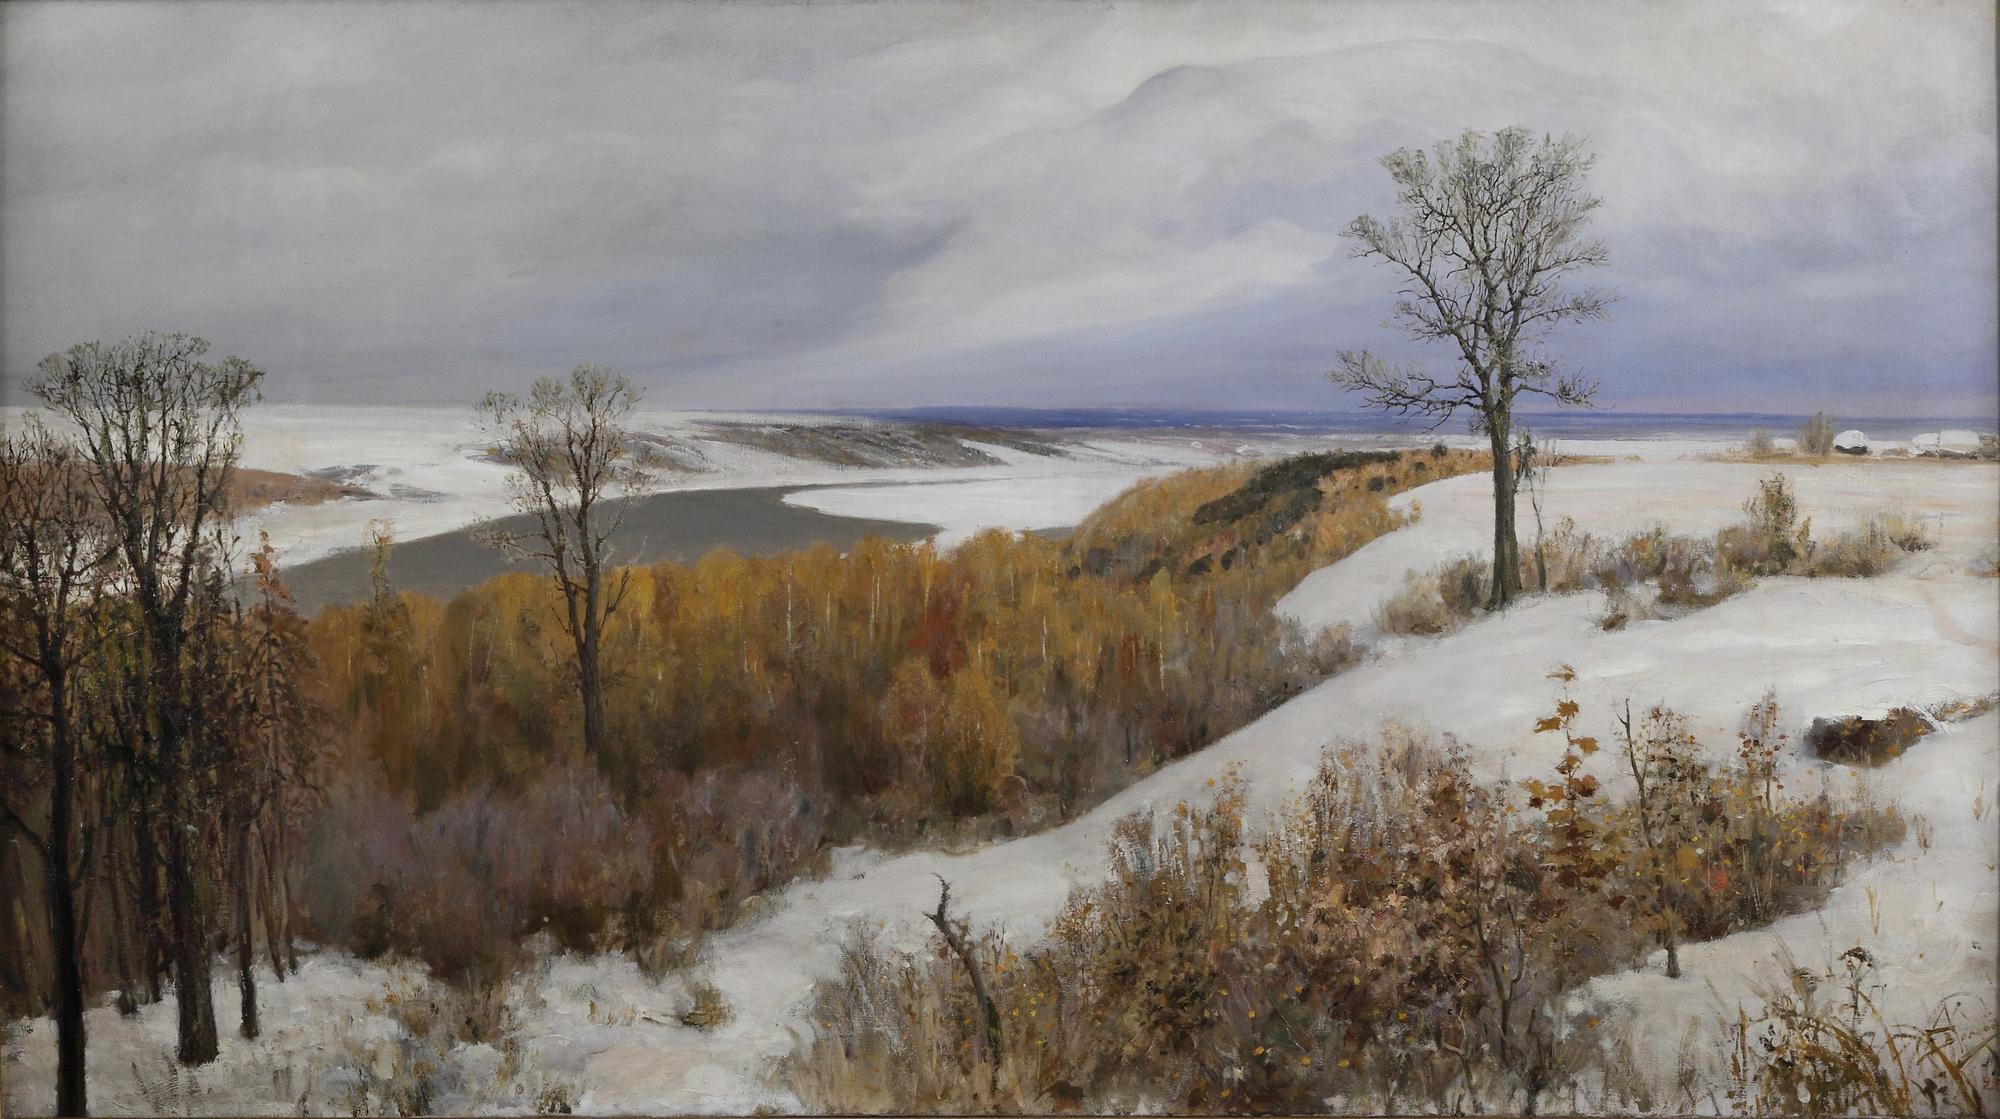 Василий Поленов. Ранний снег. Бёхово